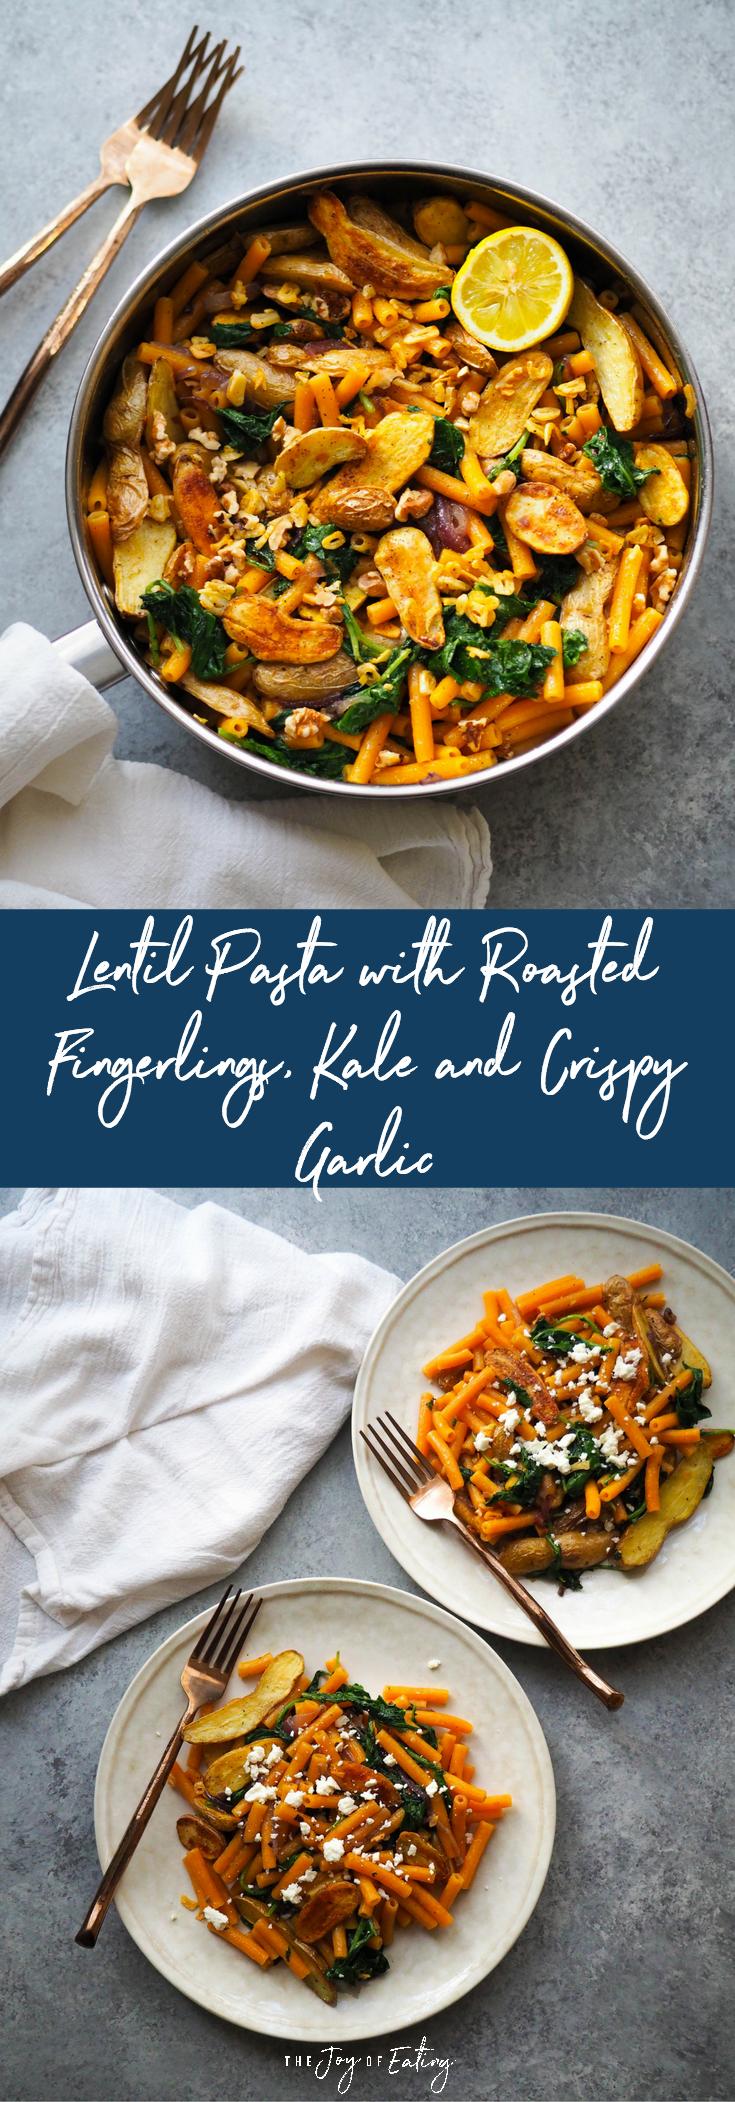 Lentil-Pasta-with-Roasted-Fingerlings.png